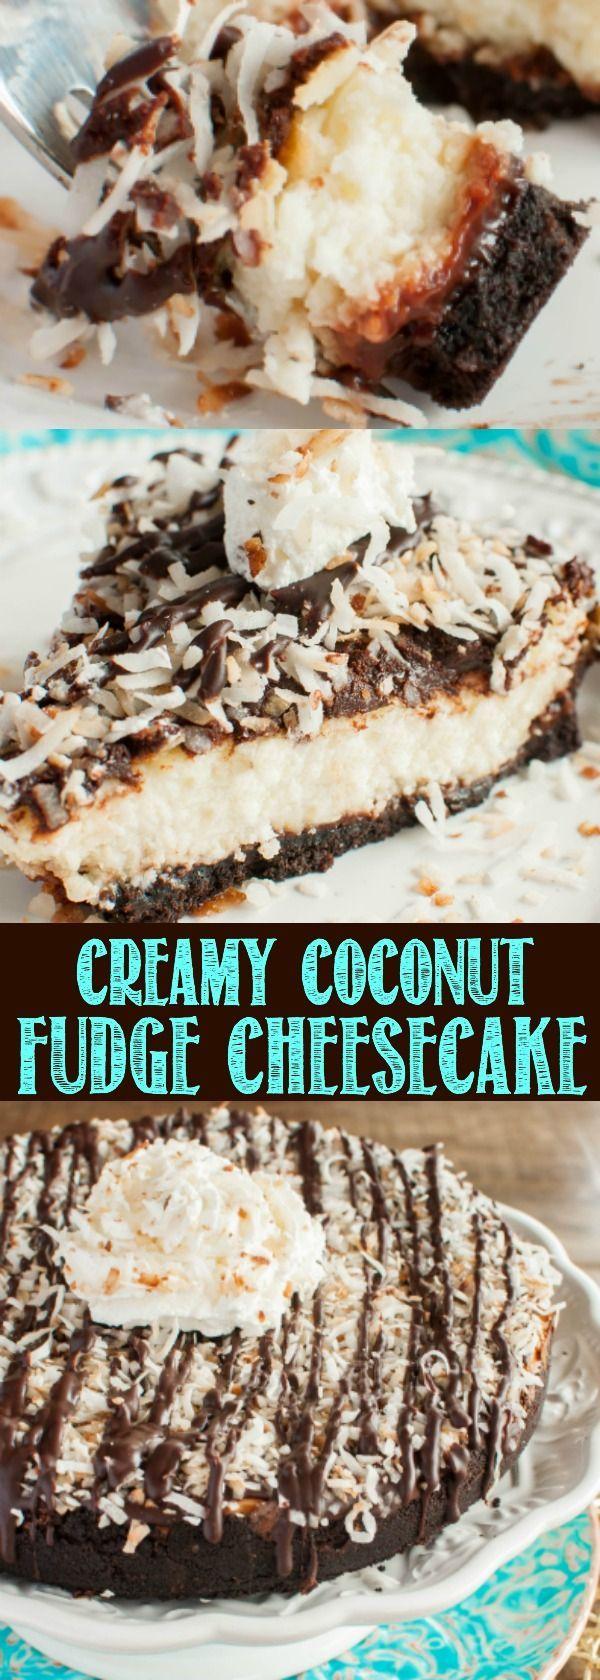 Coconut Fudge Cheesecake - an Oreo fudge crust layered with creamy coconut cheesecake, topped with chocolate ganache and toasted coconut! Heavenly!